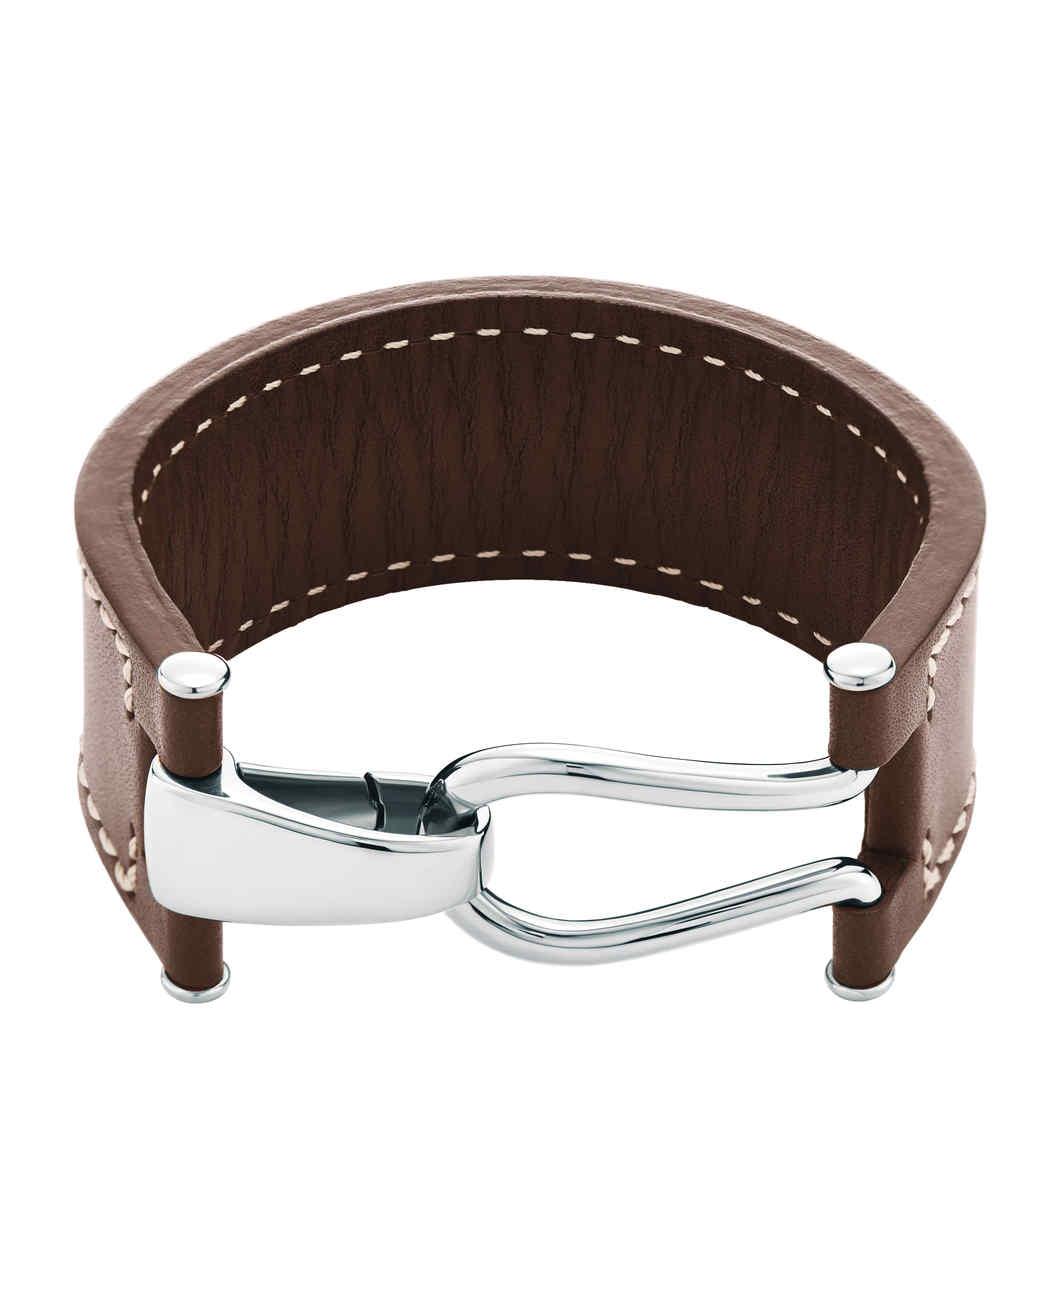 tiffanys-bracelet-s112550.jpg